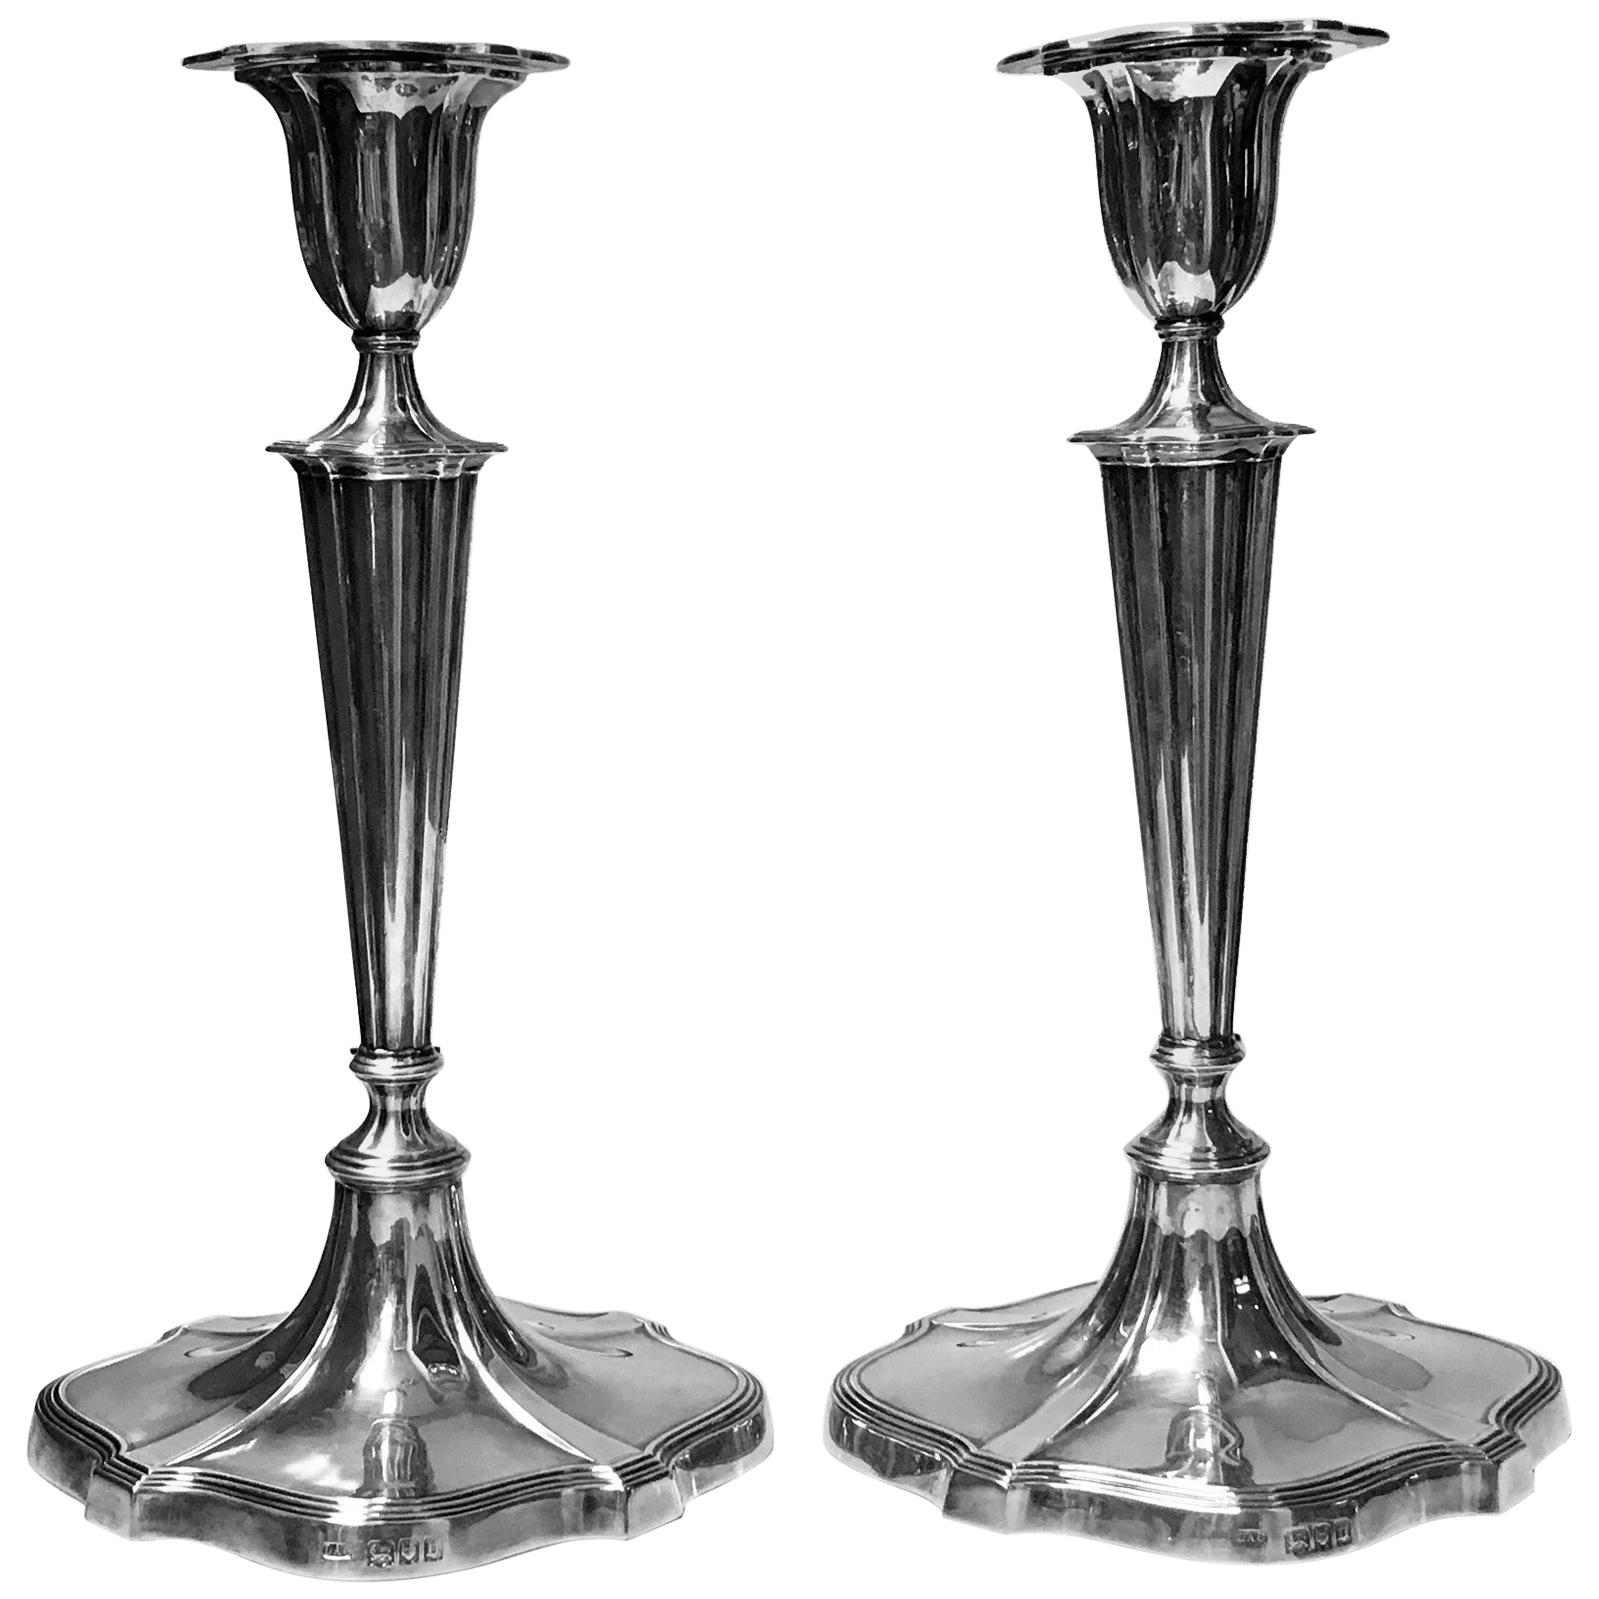 Georgian Style Sterling Silver Candlesticks, Crichton, London, 1917